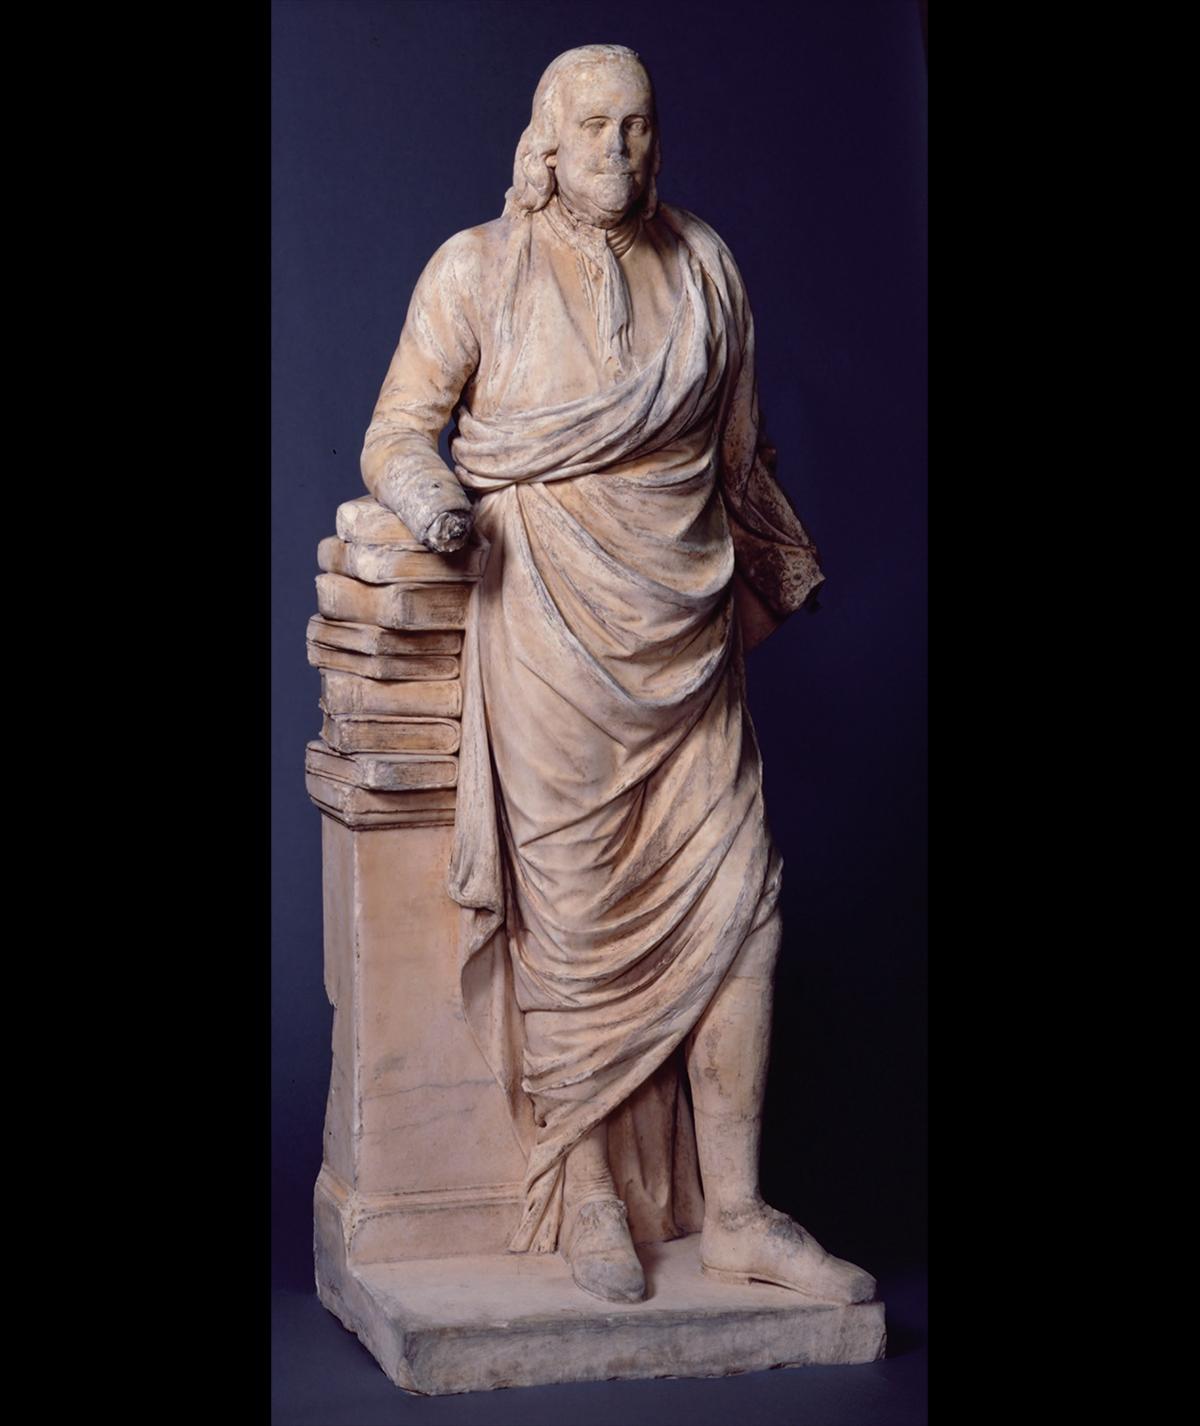 Benajmin Franklin marble sculpture